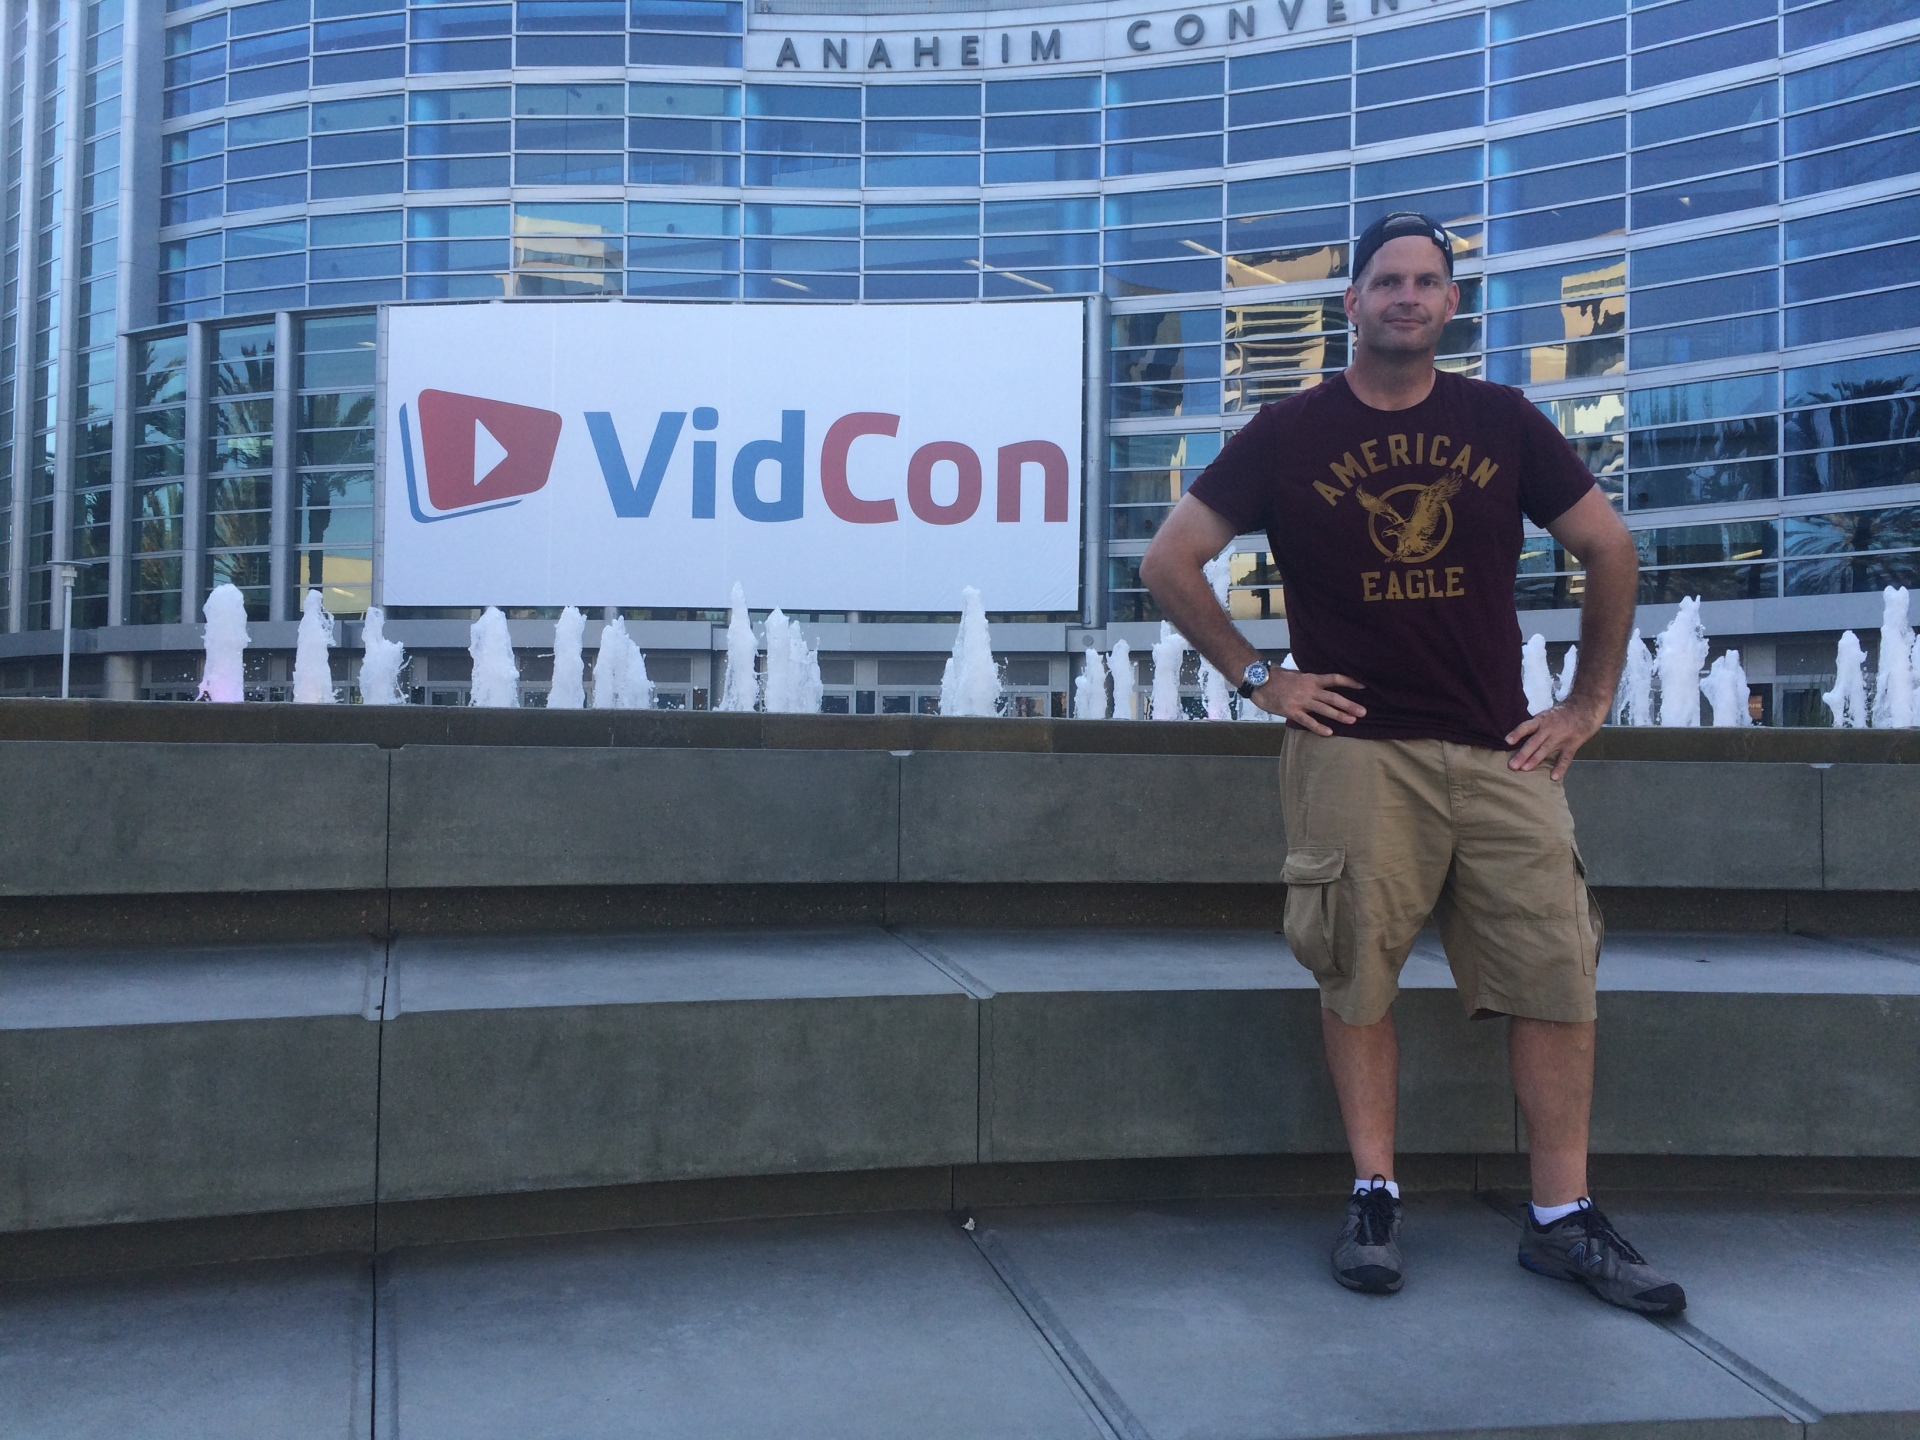 James Lamprey, FunFoodsYT, VidCon, VidCon 2015, Youtube